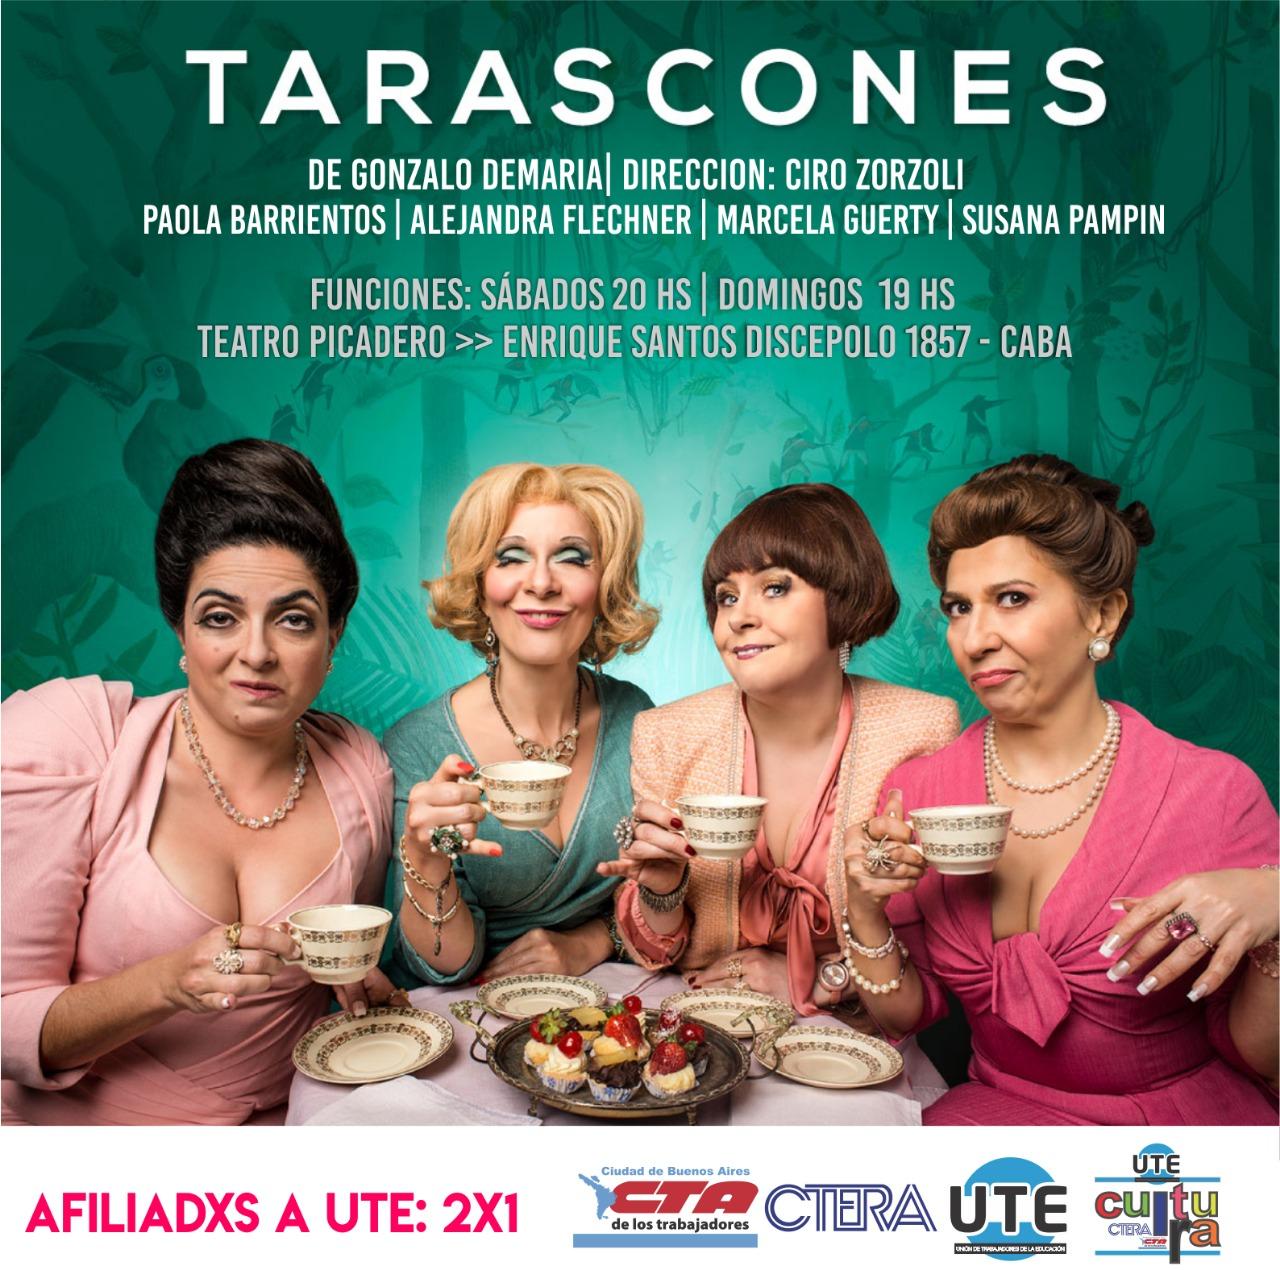 Tarascones - Dir: Ciro Zorzoli - Afiliadxs a UTE: 2x1